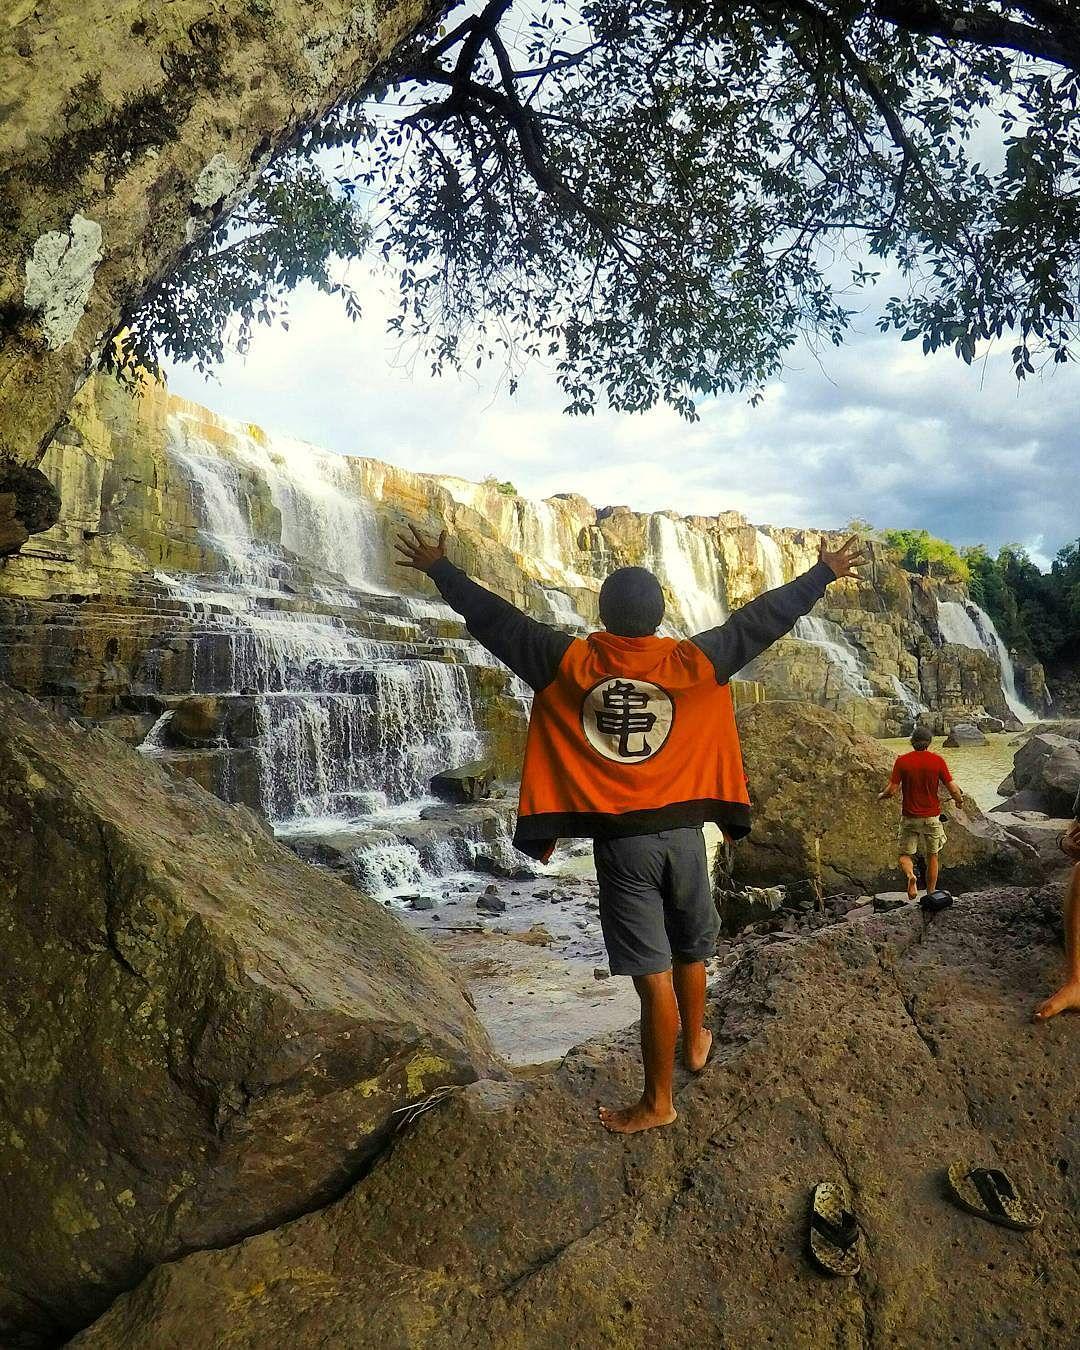 Waterfall In Dalat, Vietnam - Instagram @ThinkTravelLiftGrow